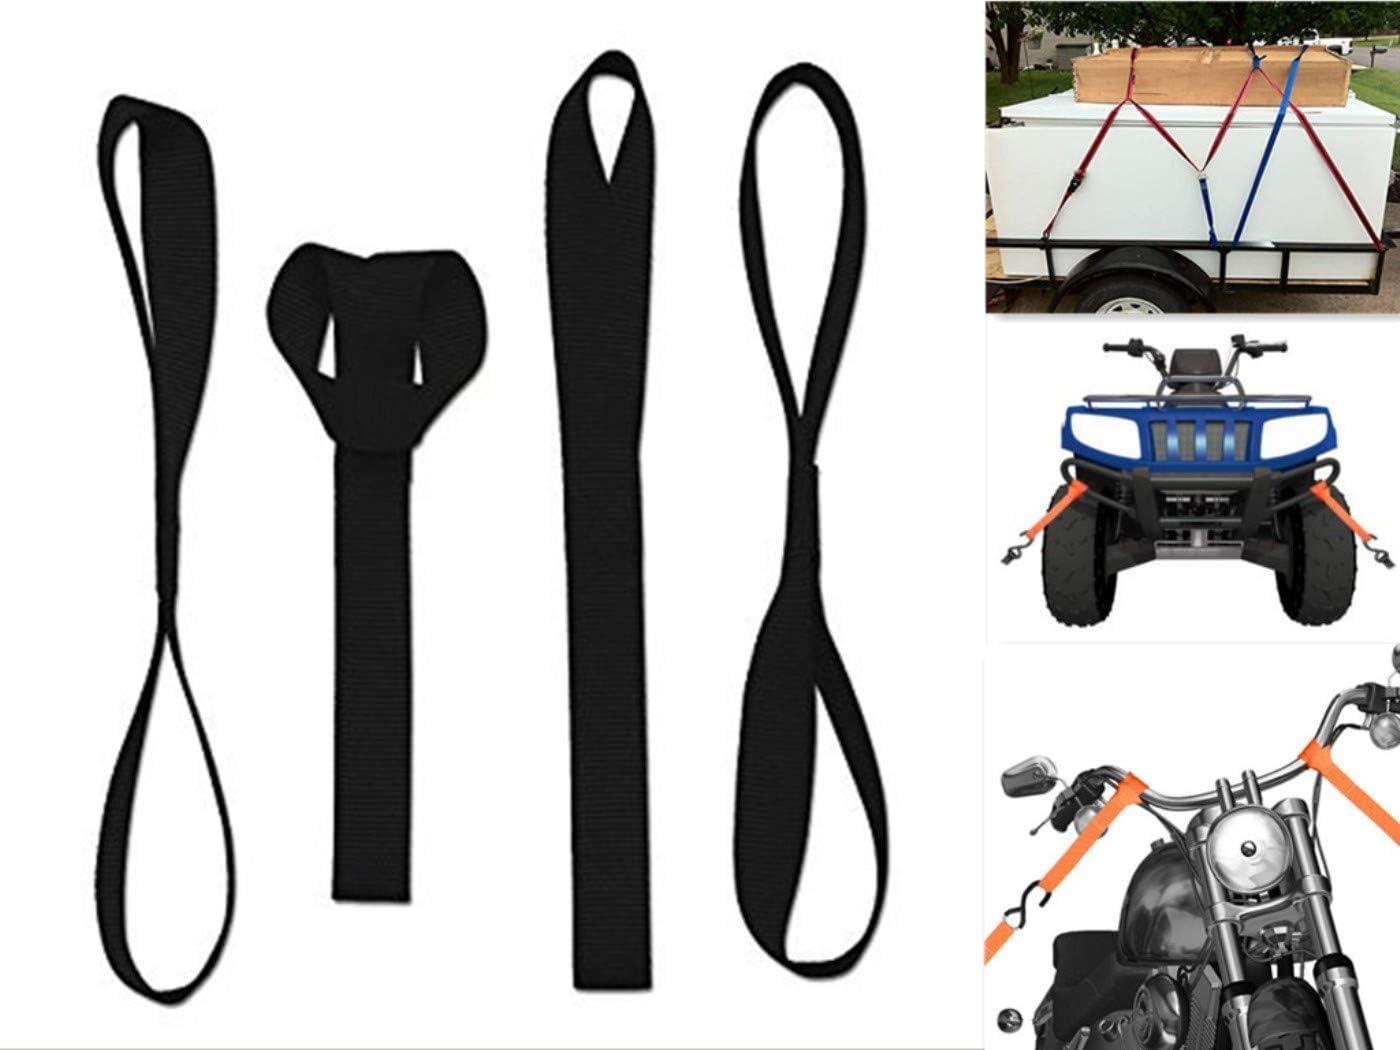 10000 lb Load Capacity Vehiclex Soft Loop Motorcycle Tie Down Straps 1.5 x 18 inches Lawn Equipment Secure Trailering of Bikes ATV UTV Black 4 Pack Tie-Down Loops in Storage Bag